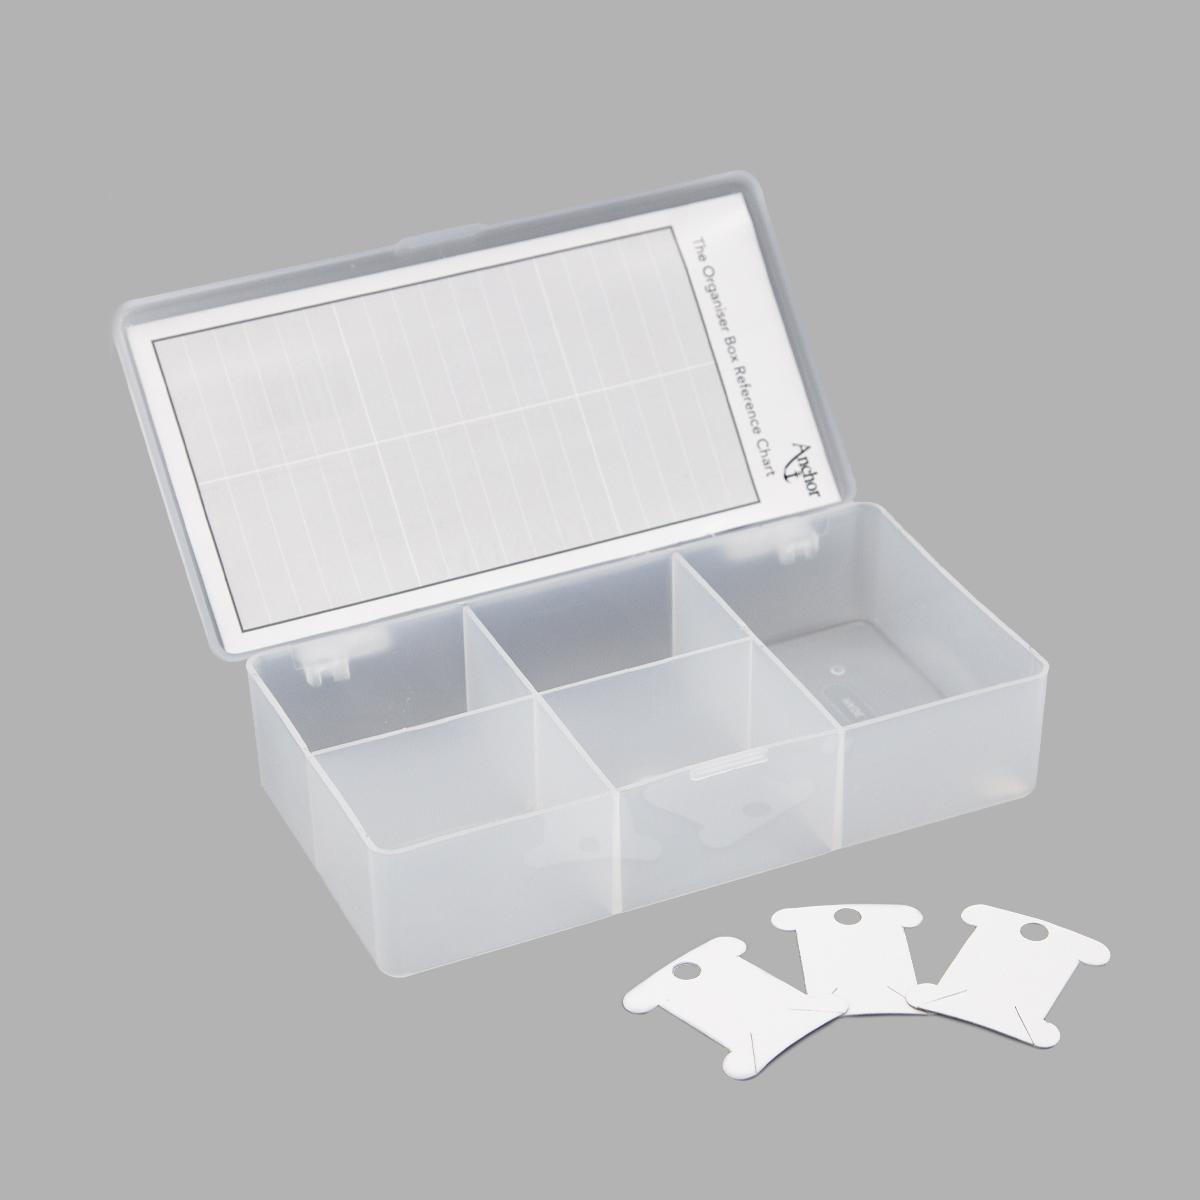 2511508 Органайзер 'Embroidery Box sml' для мулине маленький